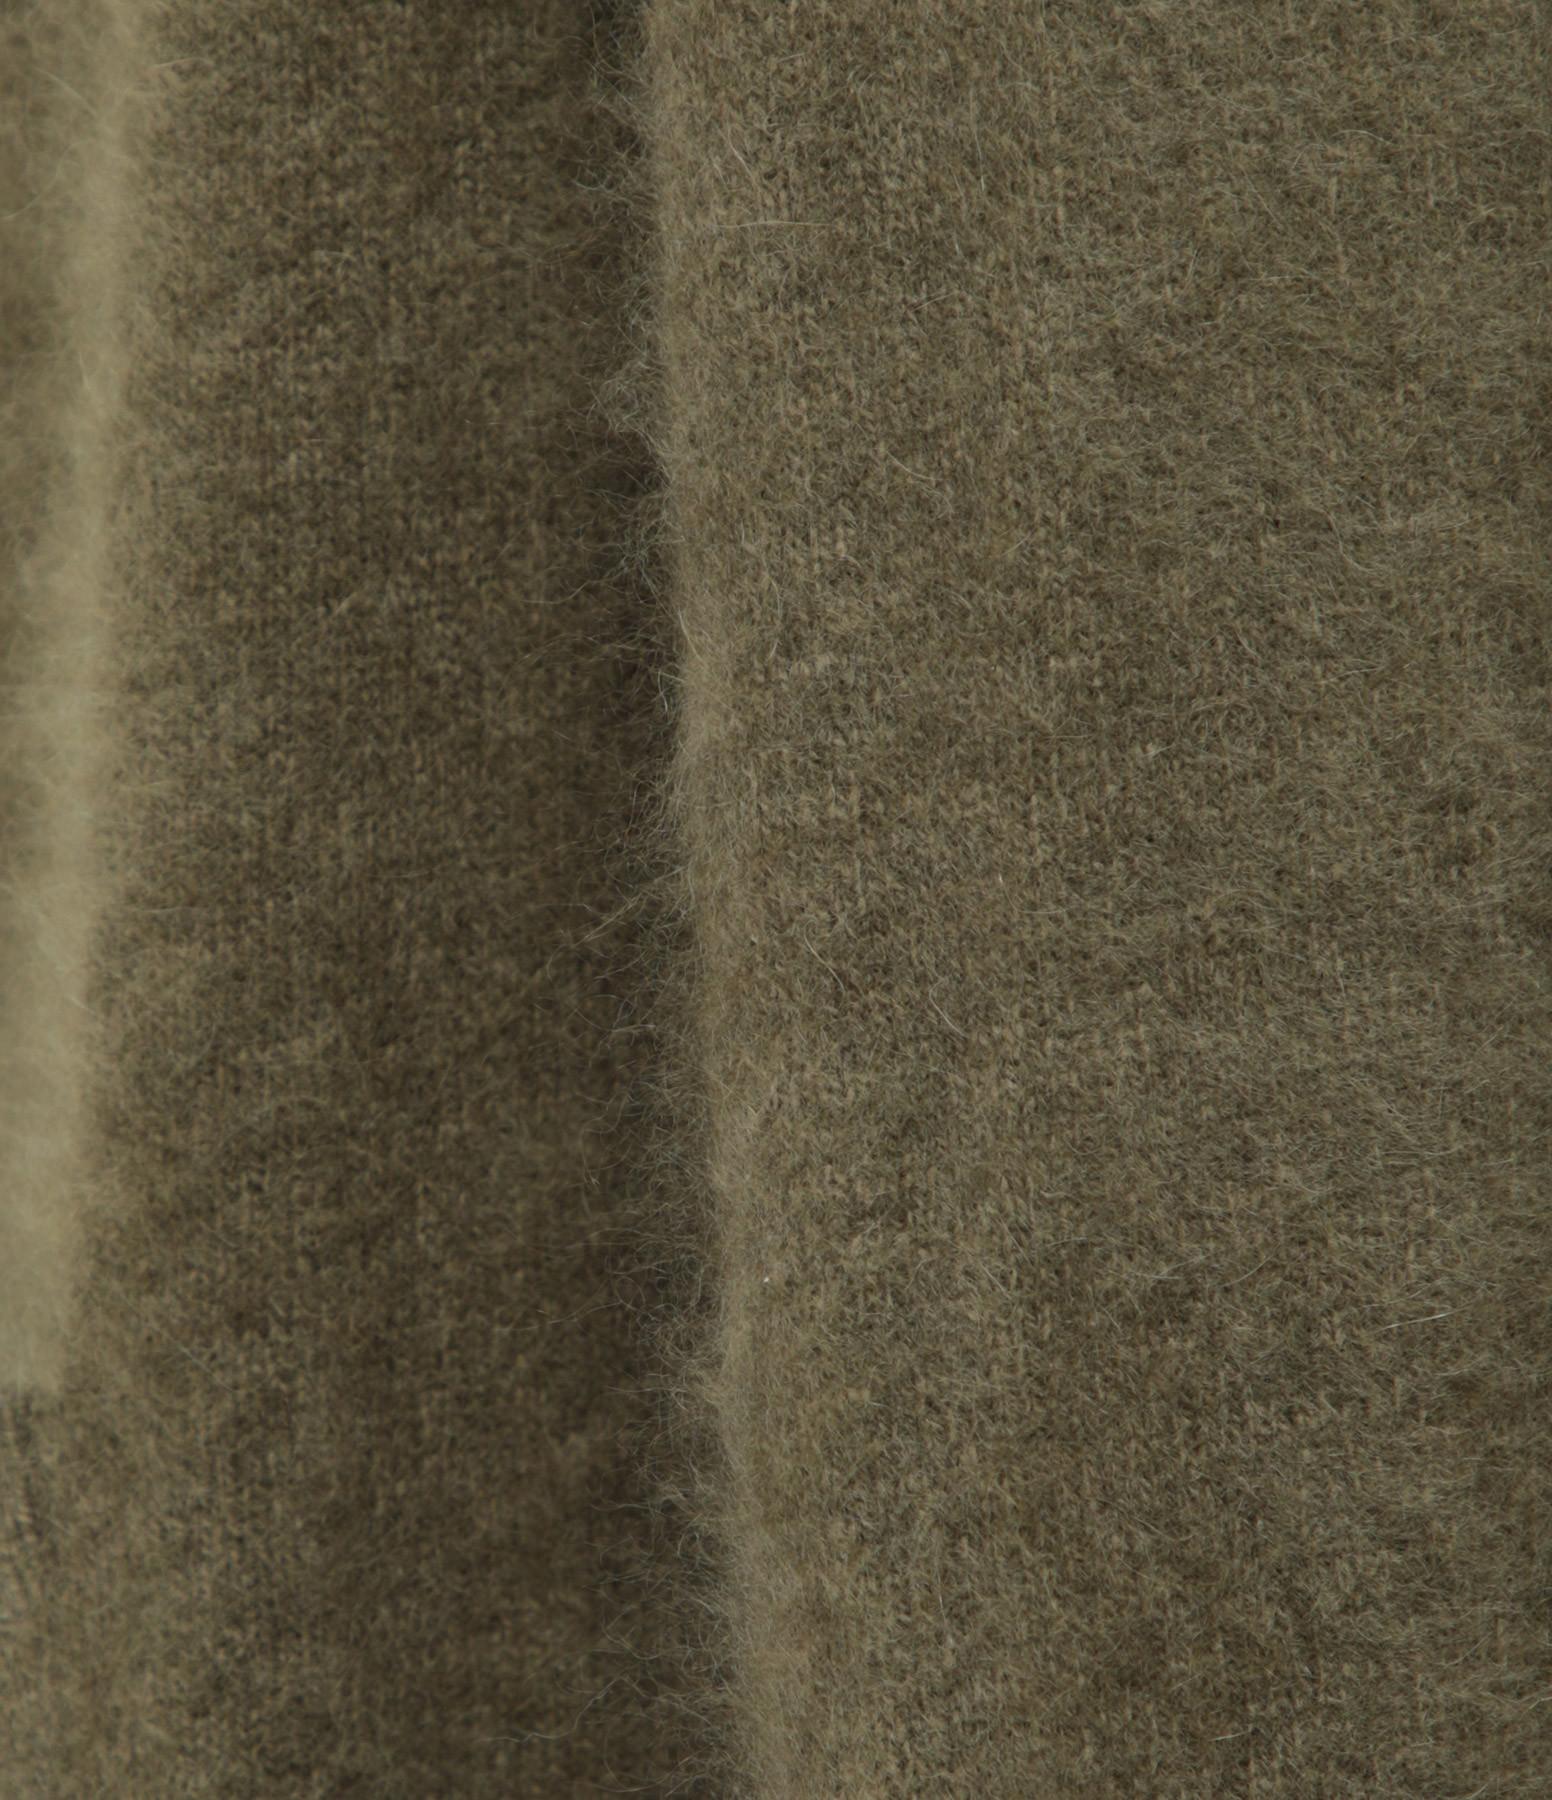 CT PLAGE - Gilet Sans Manches Raccoon Vert Olive